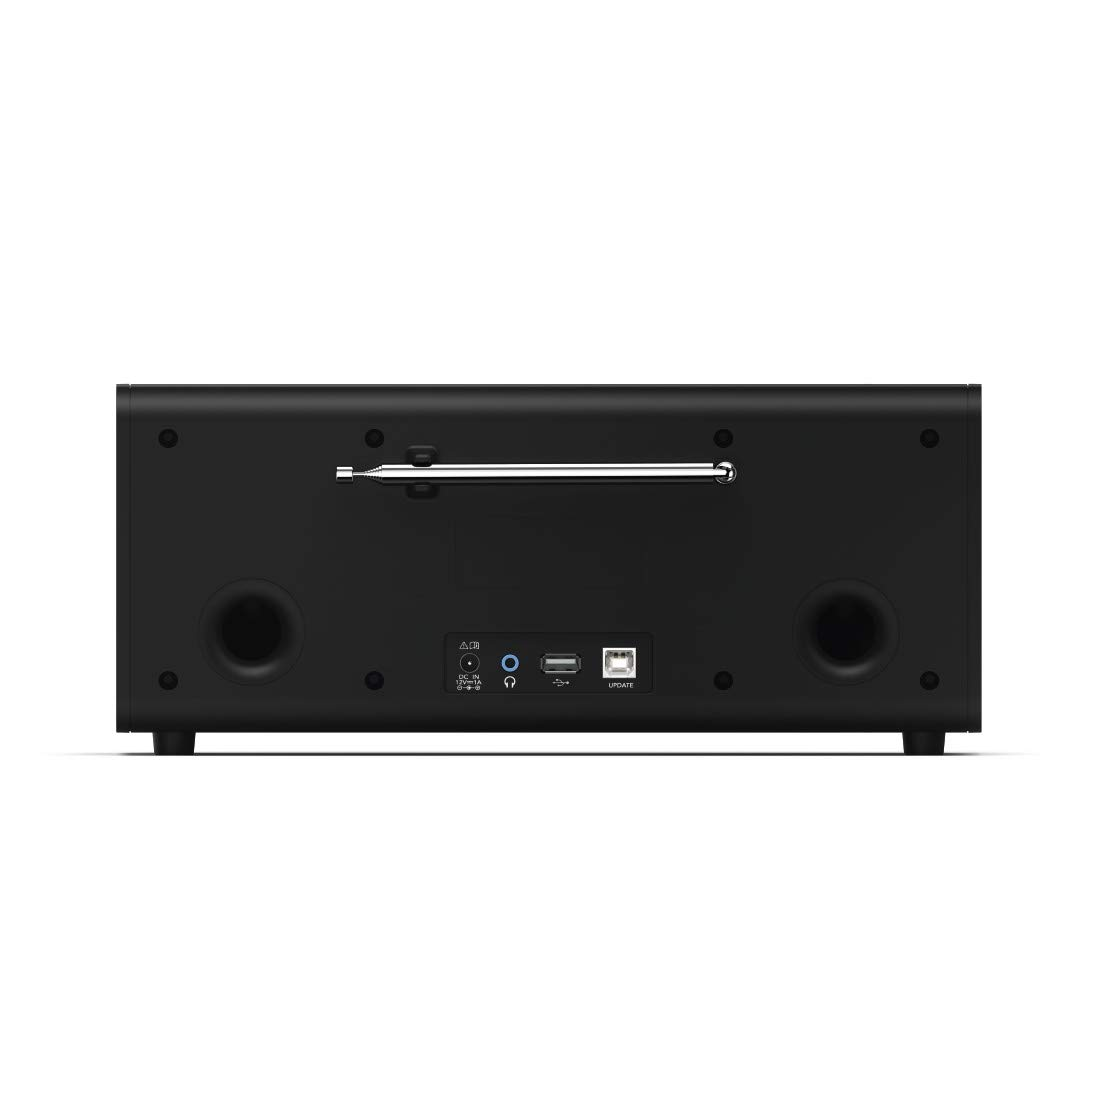 Hama DR1550CBT Portátil Digital Negro - Radio (Portátil, Digital, Dab+,DMB,FM, 87,5-108 MHz, 174-240 MHz, LCD): Amazon.es: Electrónica